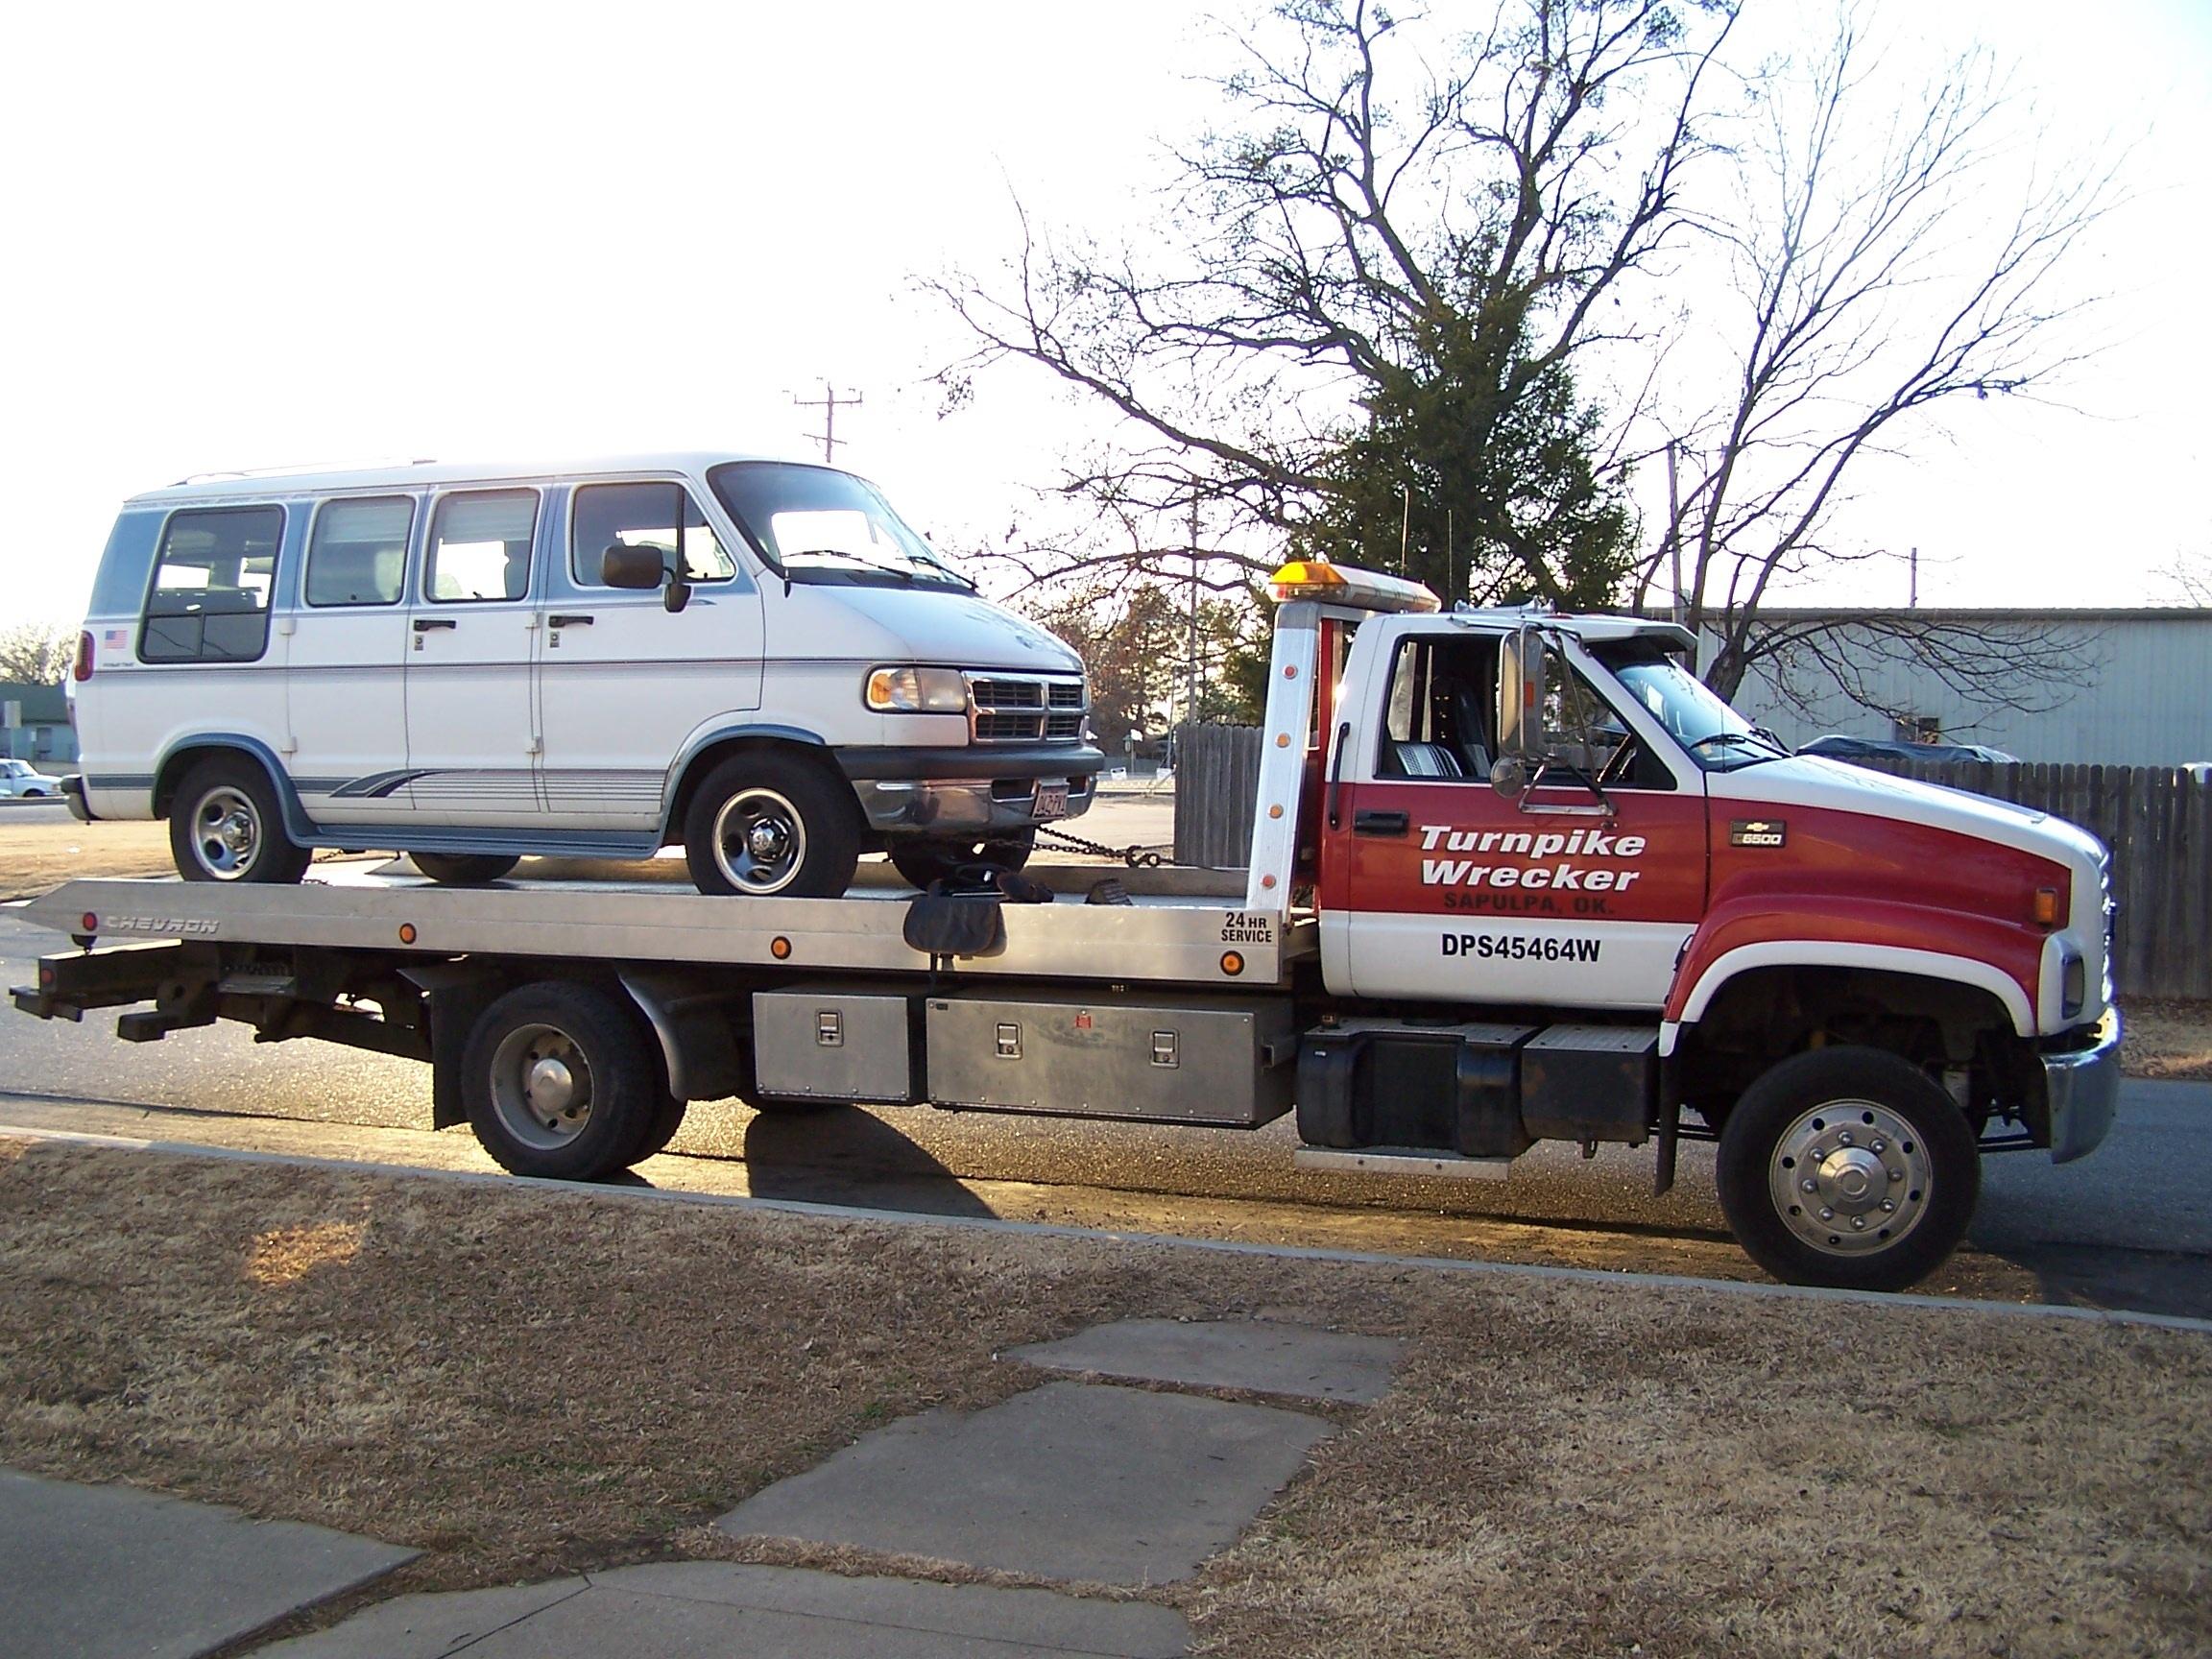 car-transport-truck-vehicle-motor-vehicle-bumper-662401-pxhere.com.jpg